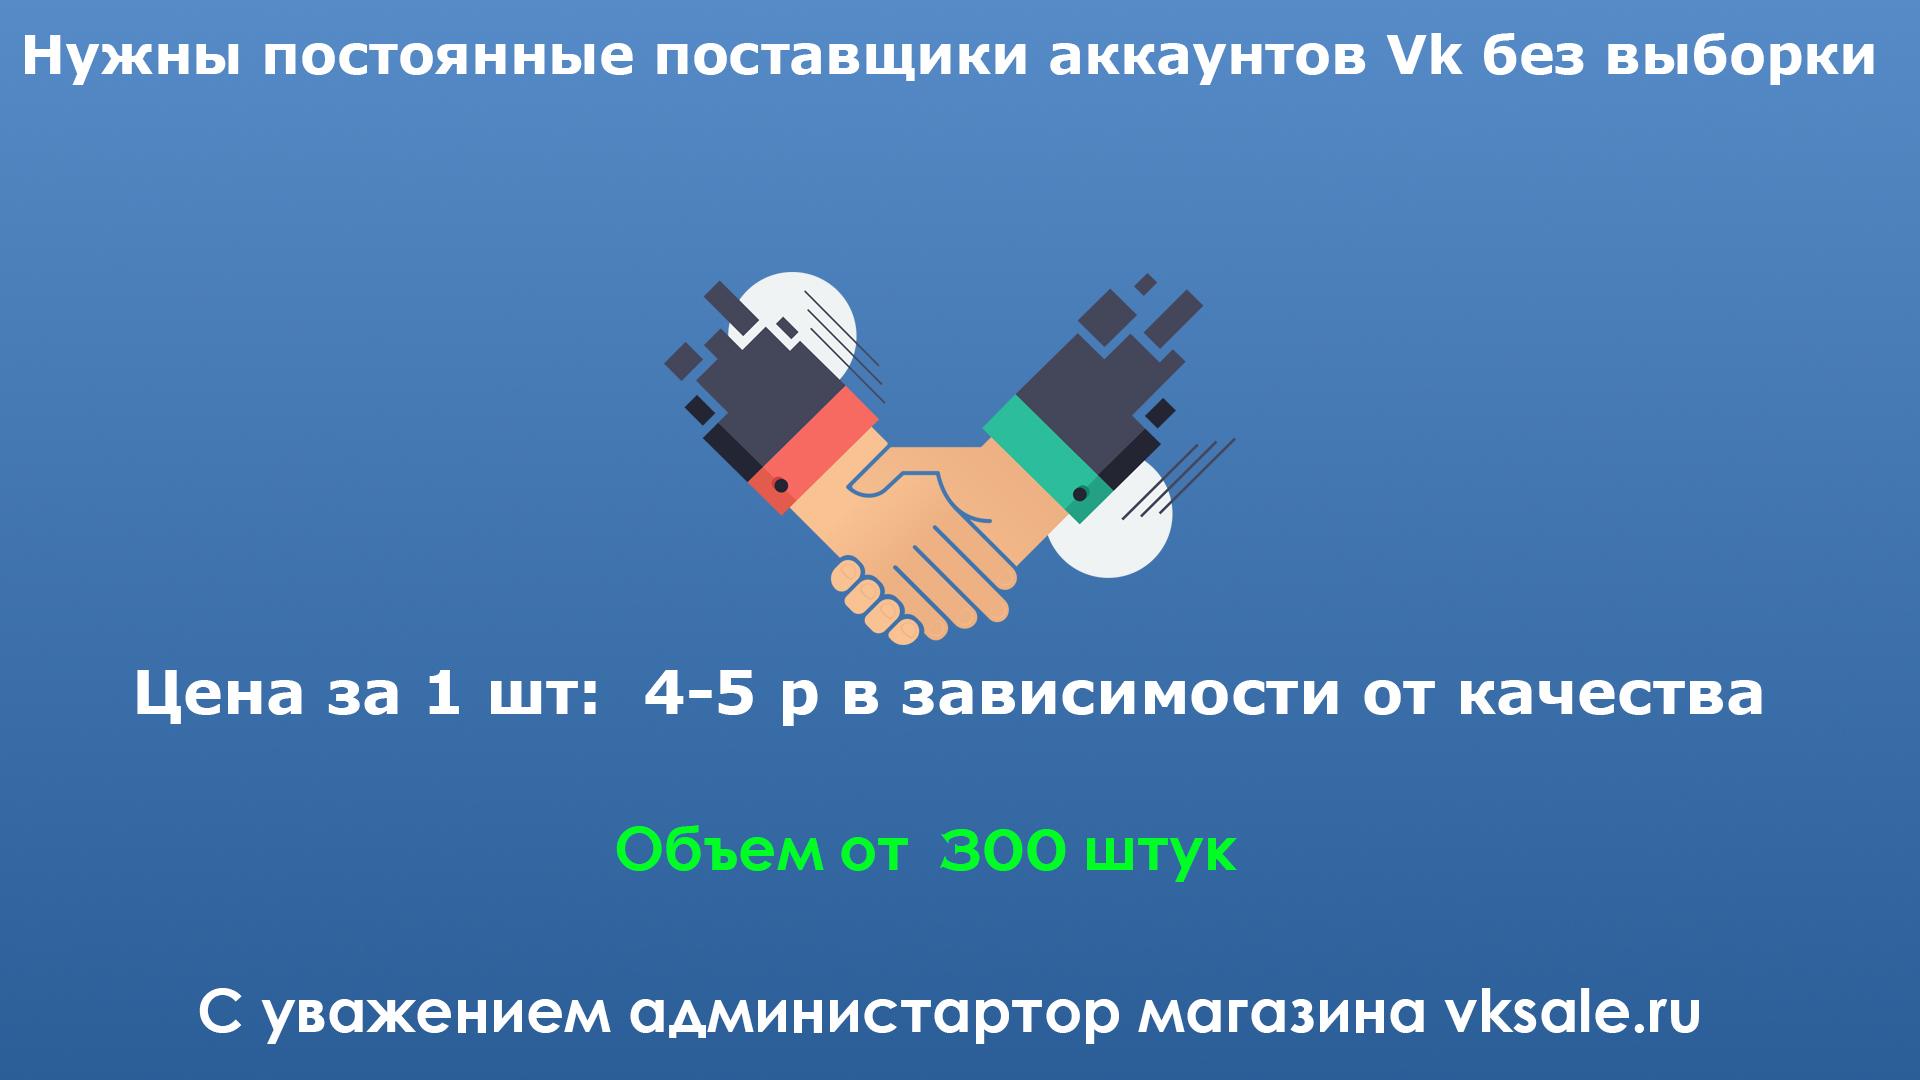 vk_jpg_pagespeed.jpg